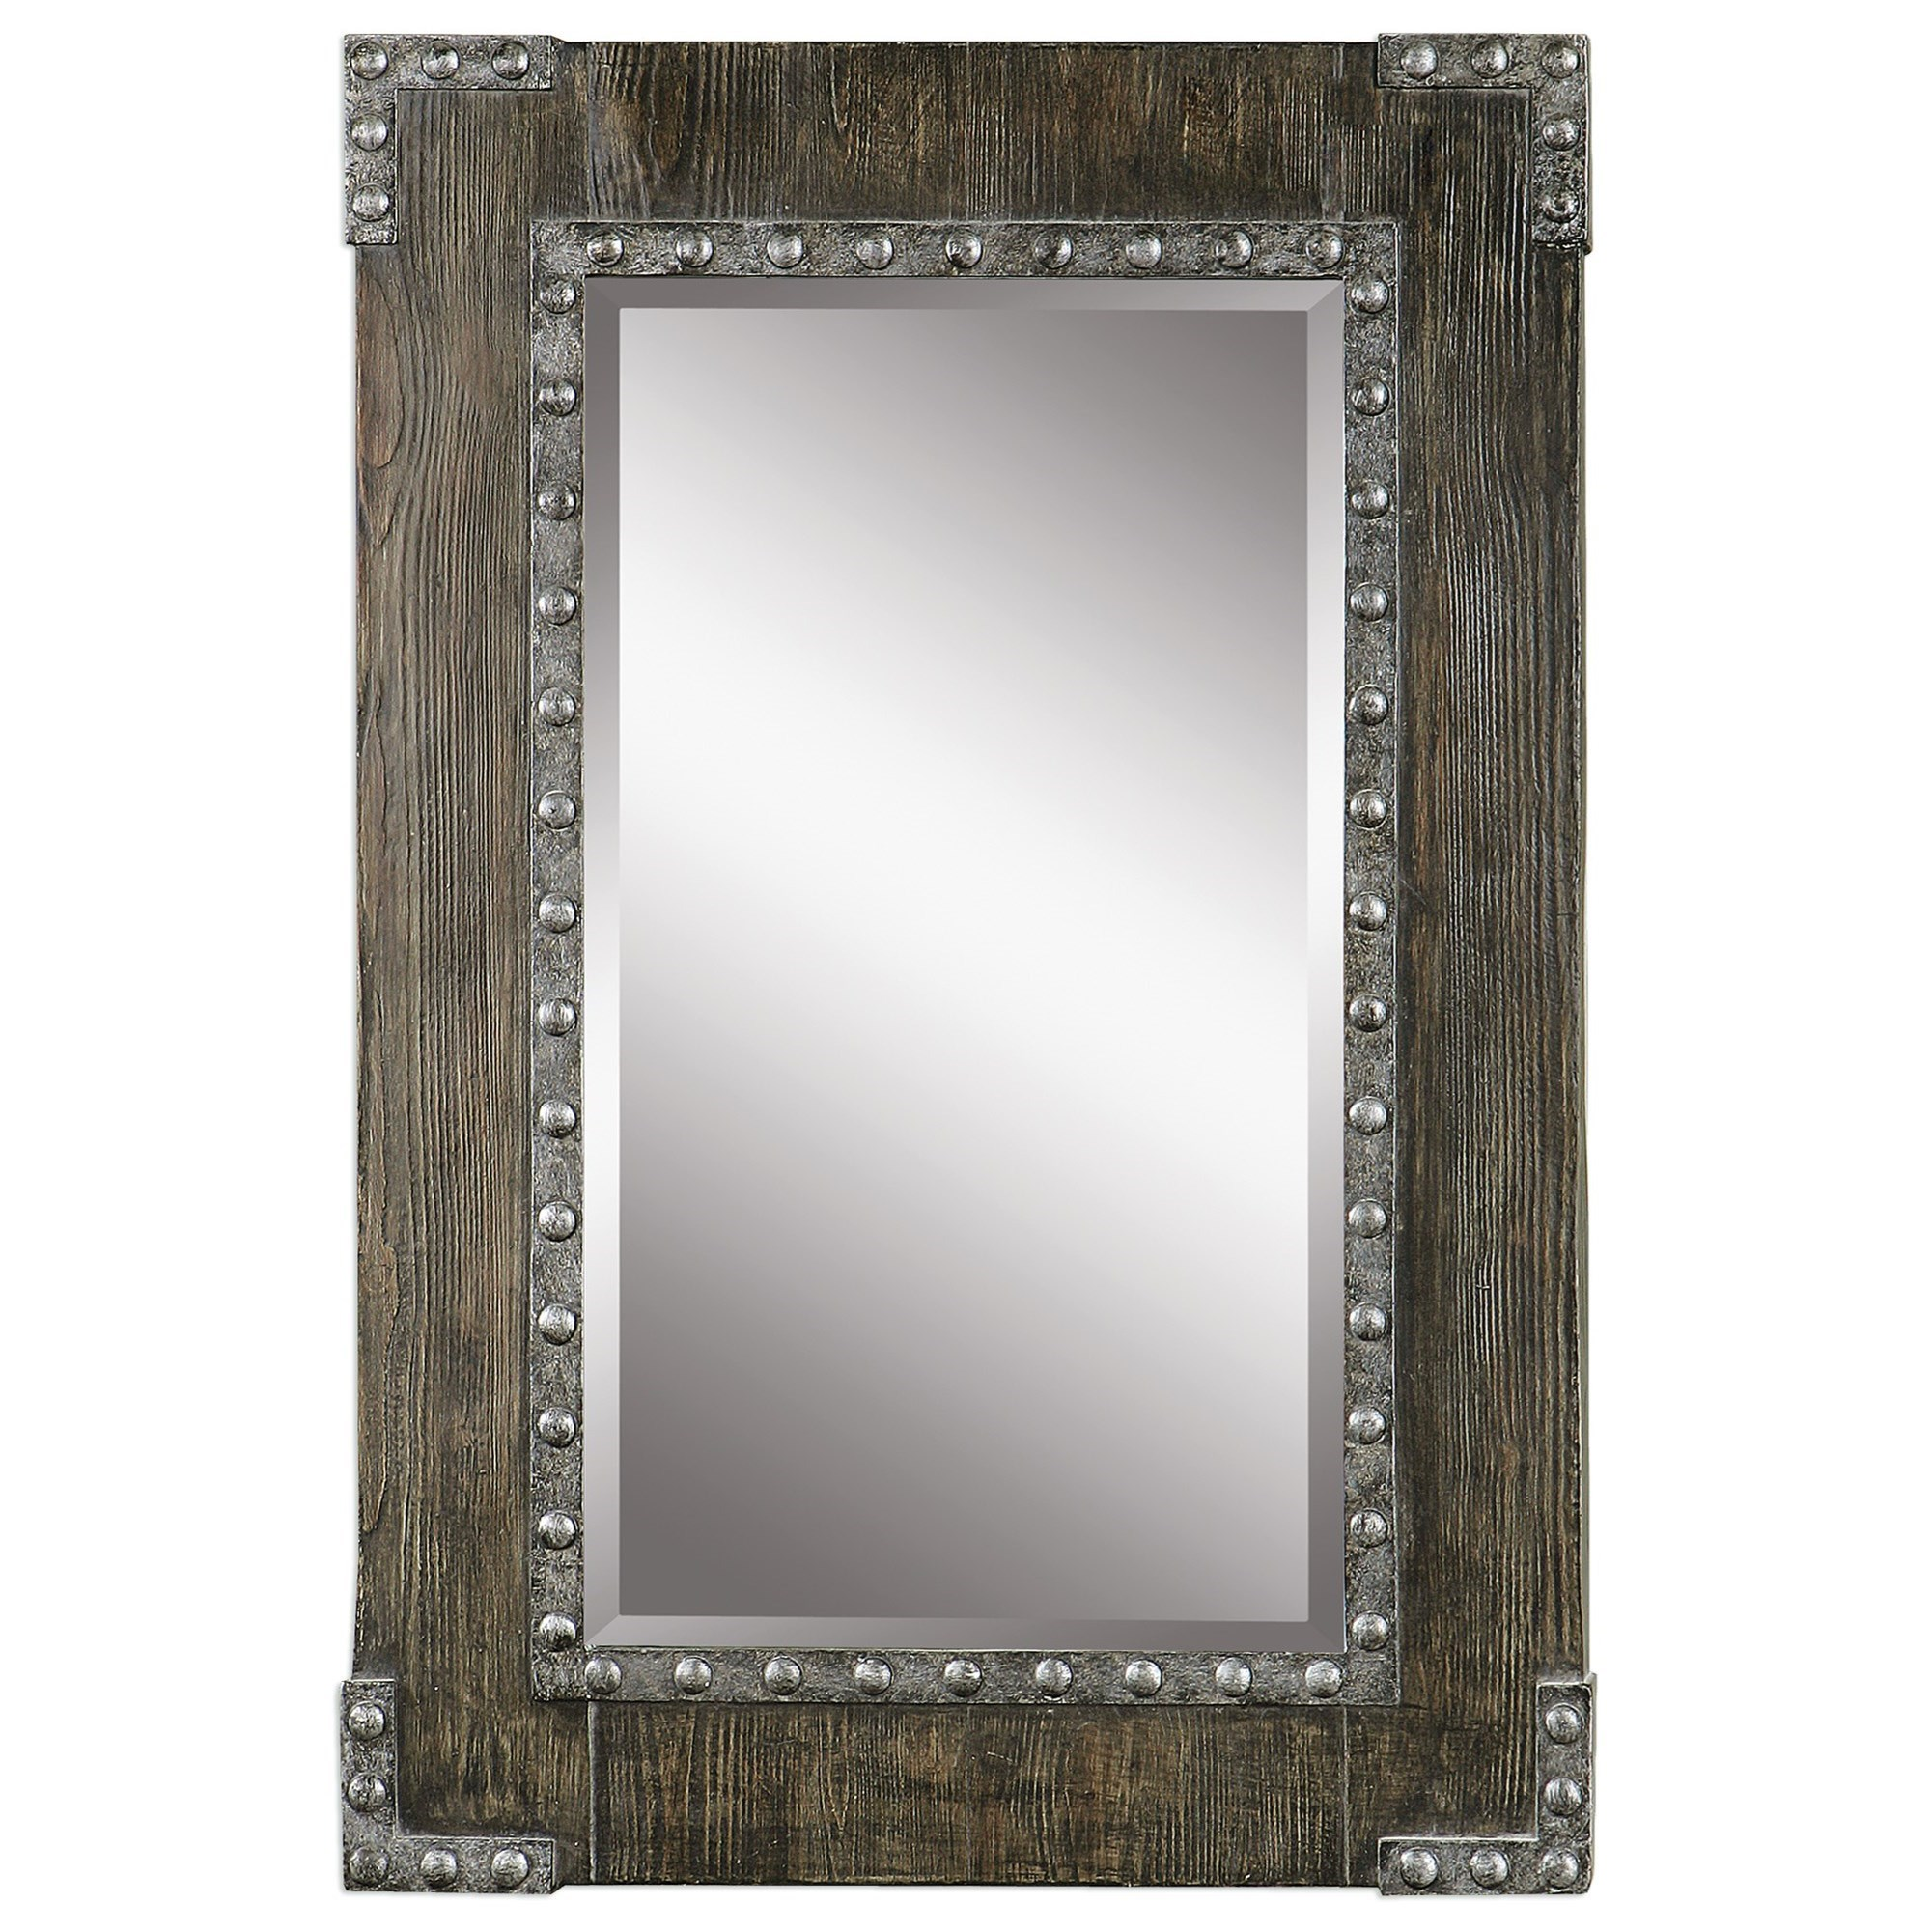 Uttermost Mirrors Malton - Item Number: 09137